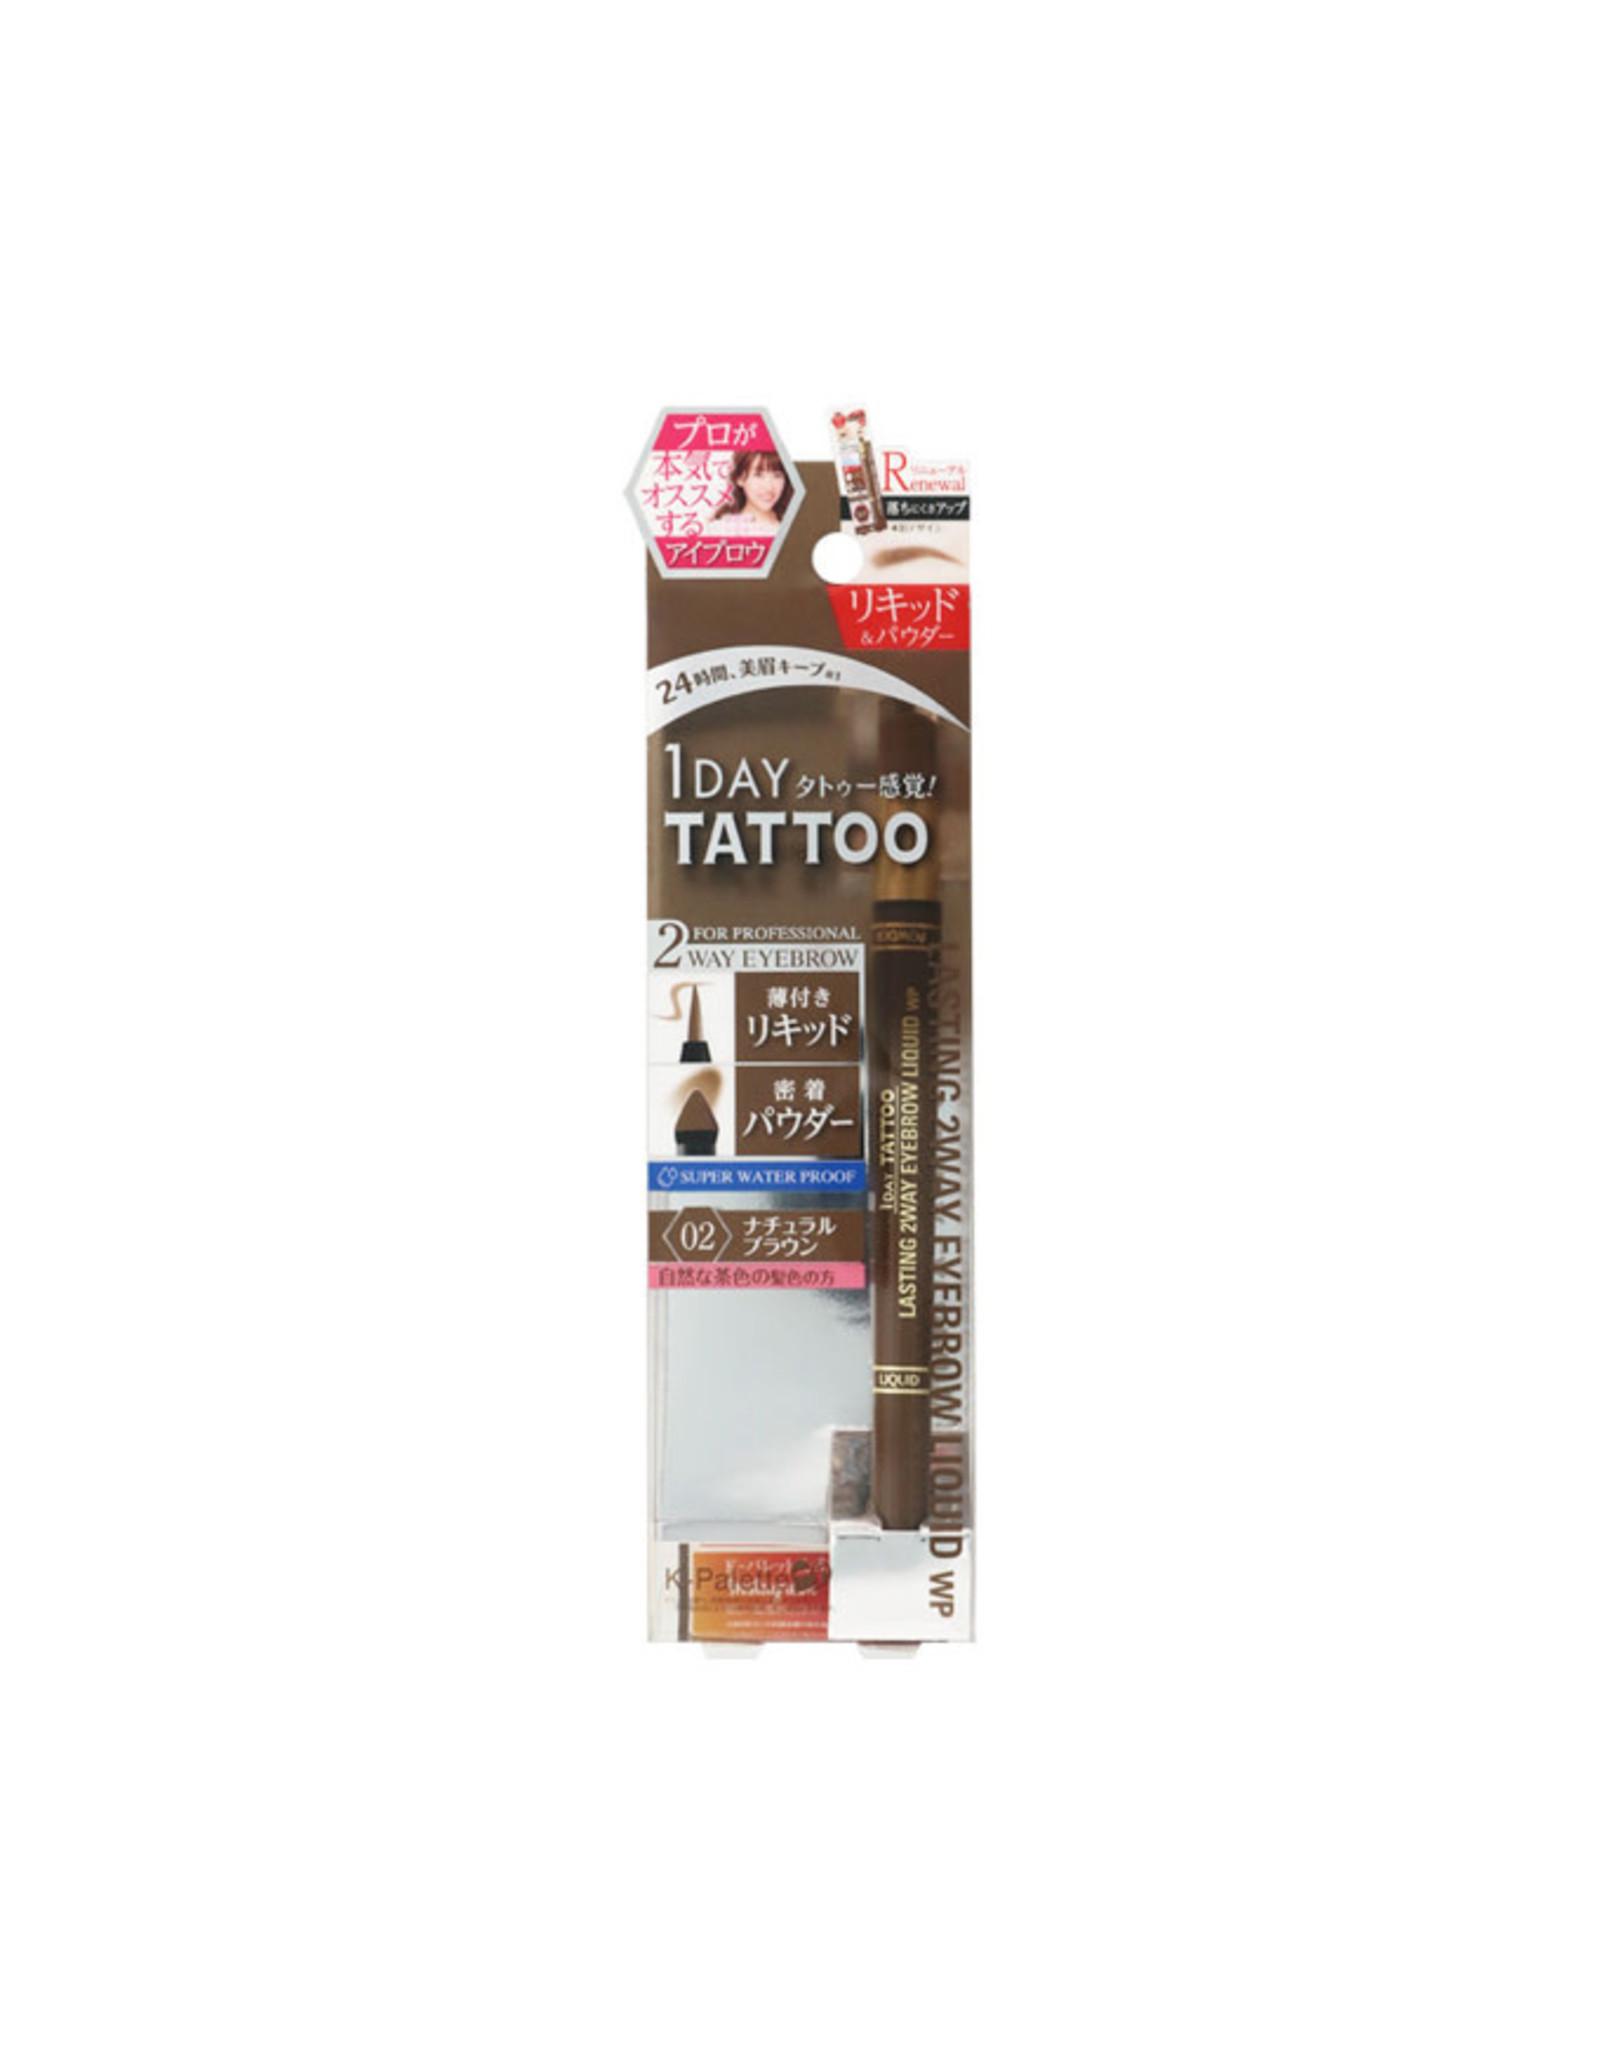 K-Palette K-Palette Lasting 2 Way Eyebrow Liquid WP #02